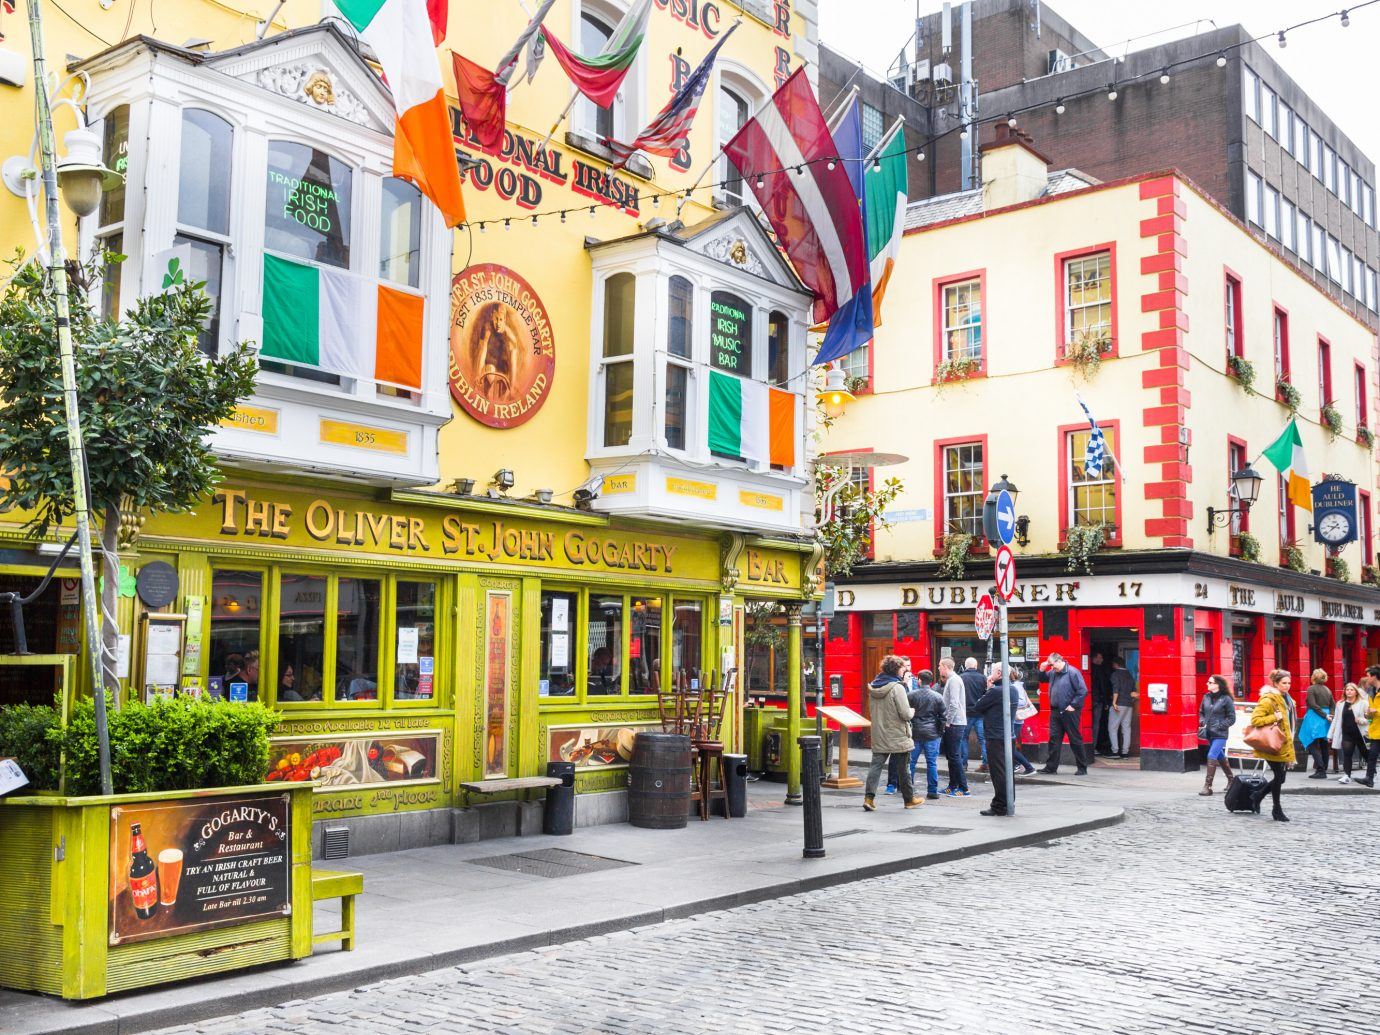 Pub on a street in Dublin Ireland.